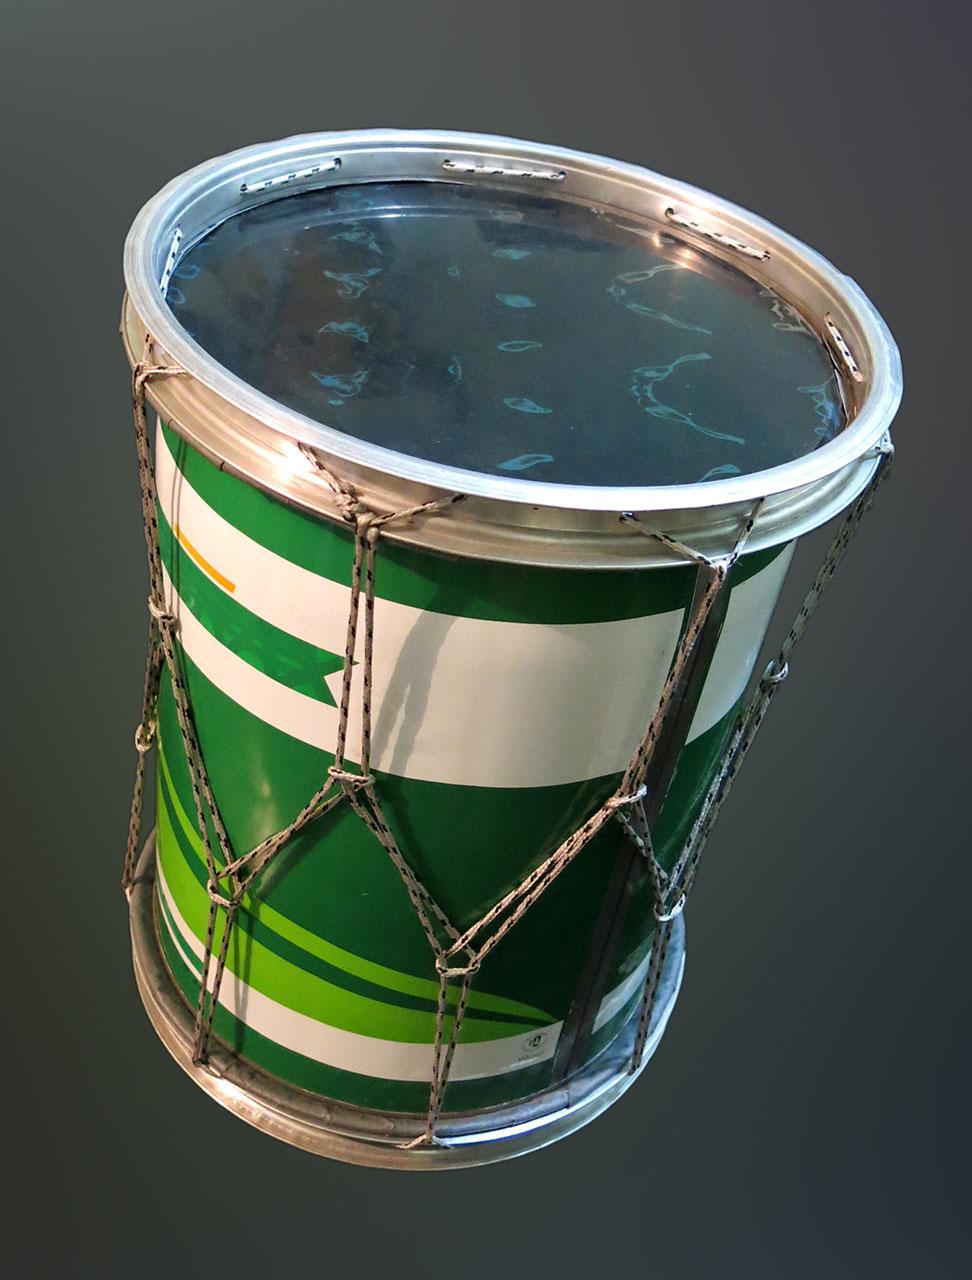 instrumento-musical